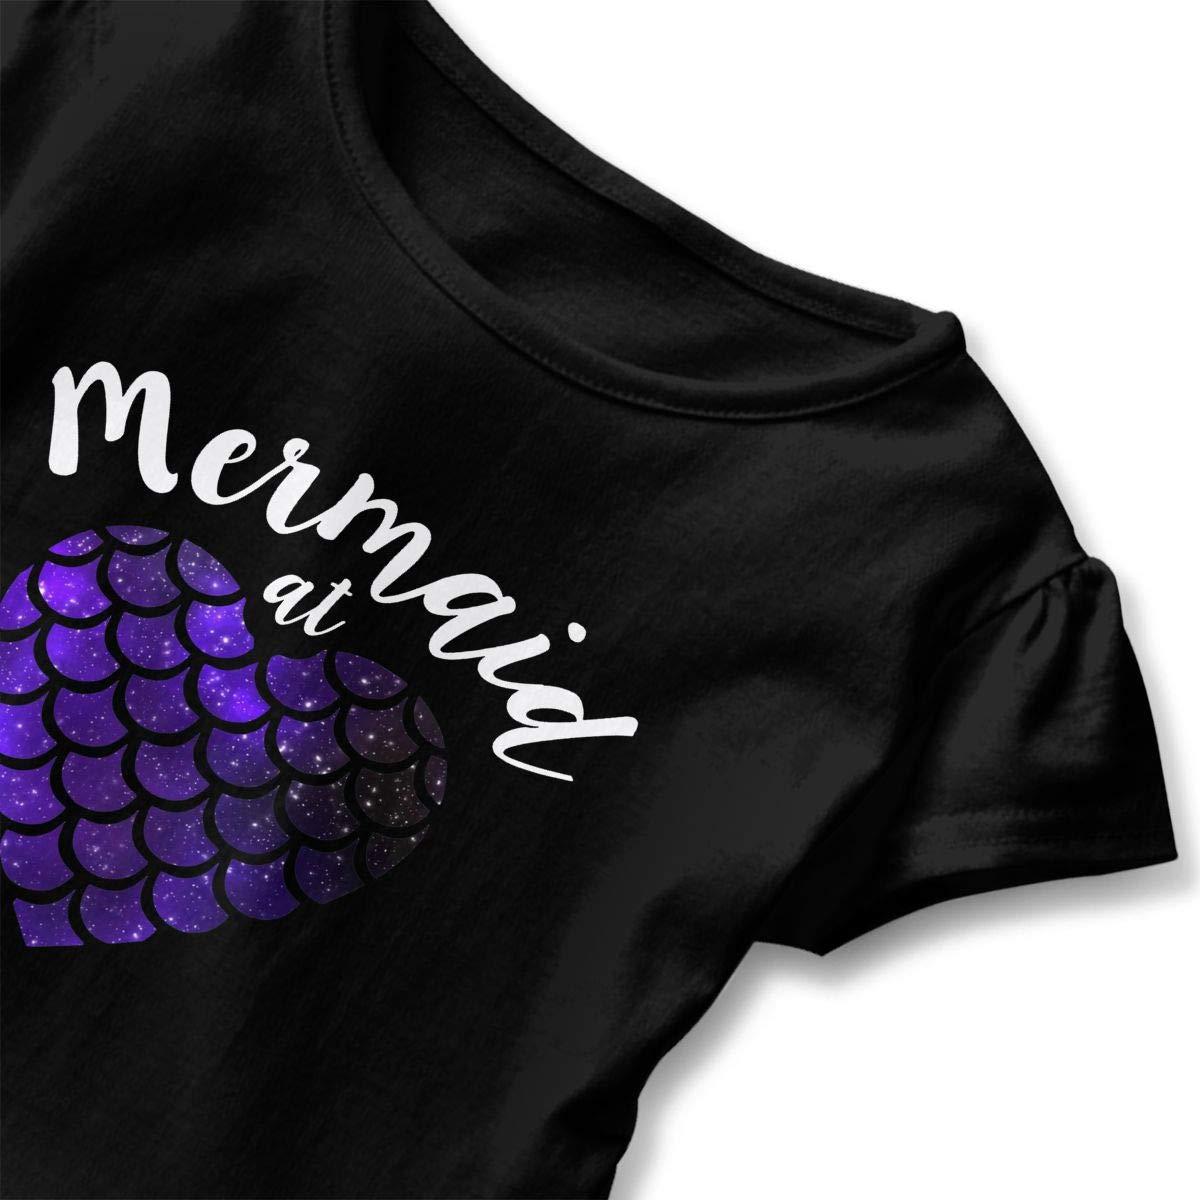 Mermaid at Heart Toddler Baby Girls Cotton Ruffle Short Sleeve Top Comfortable T-Shirt 2-6T